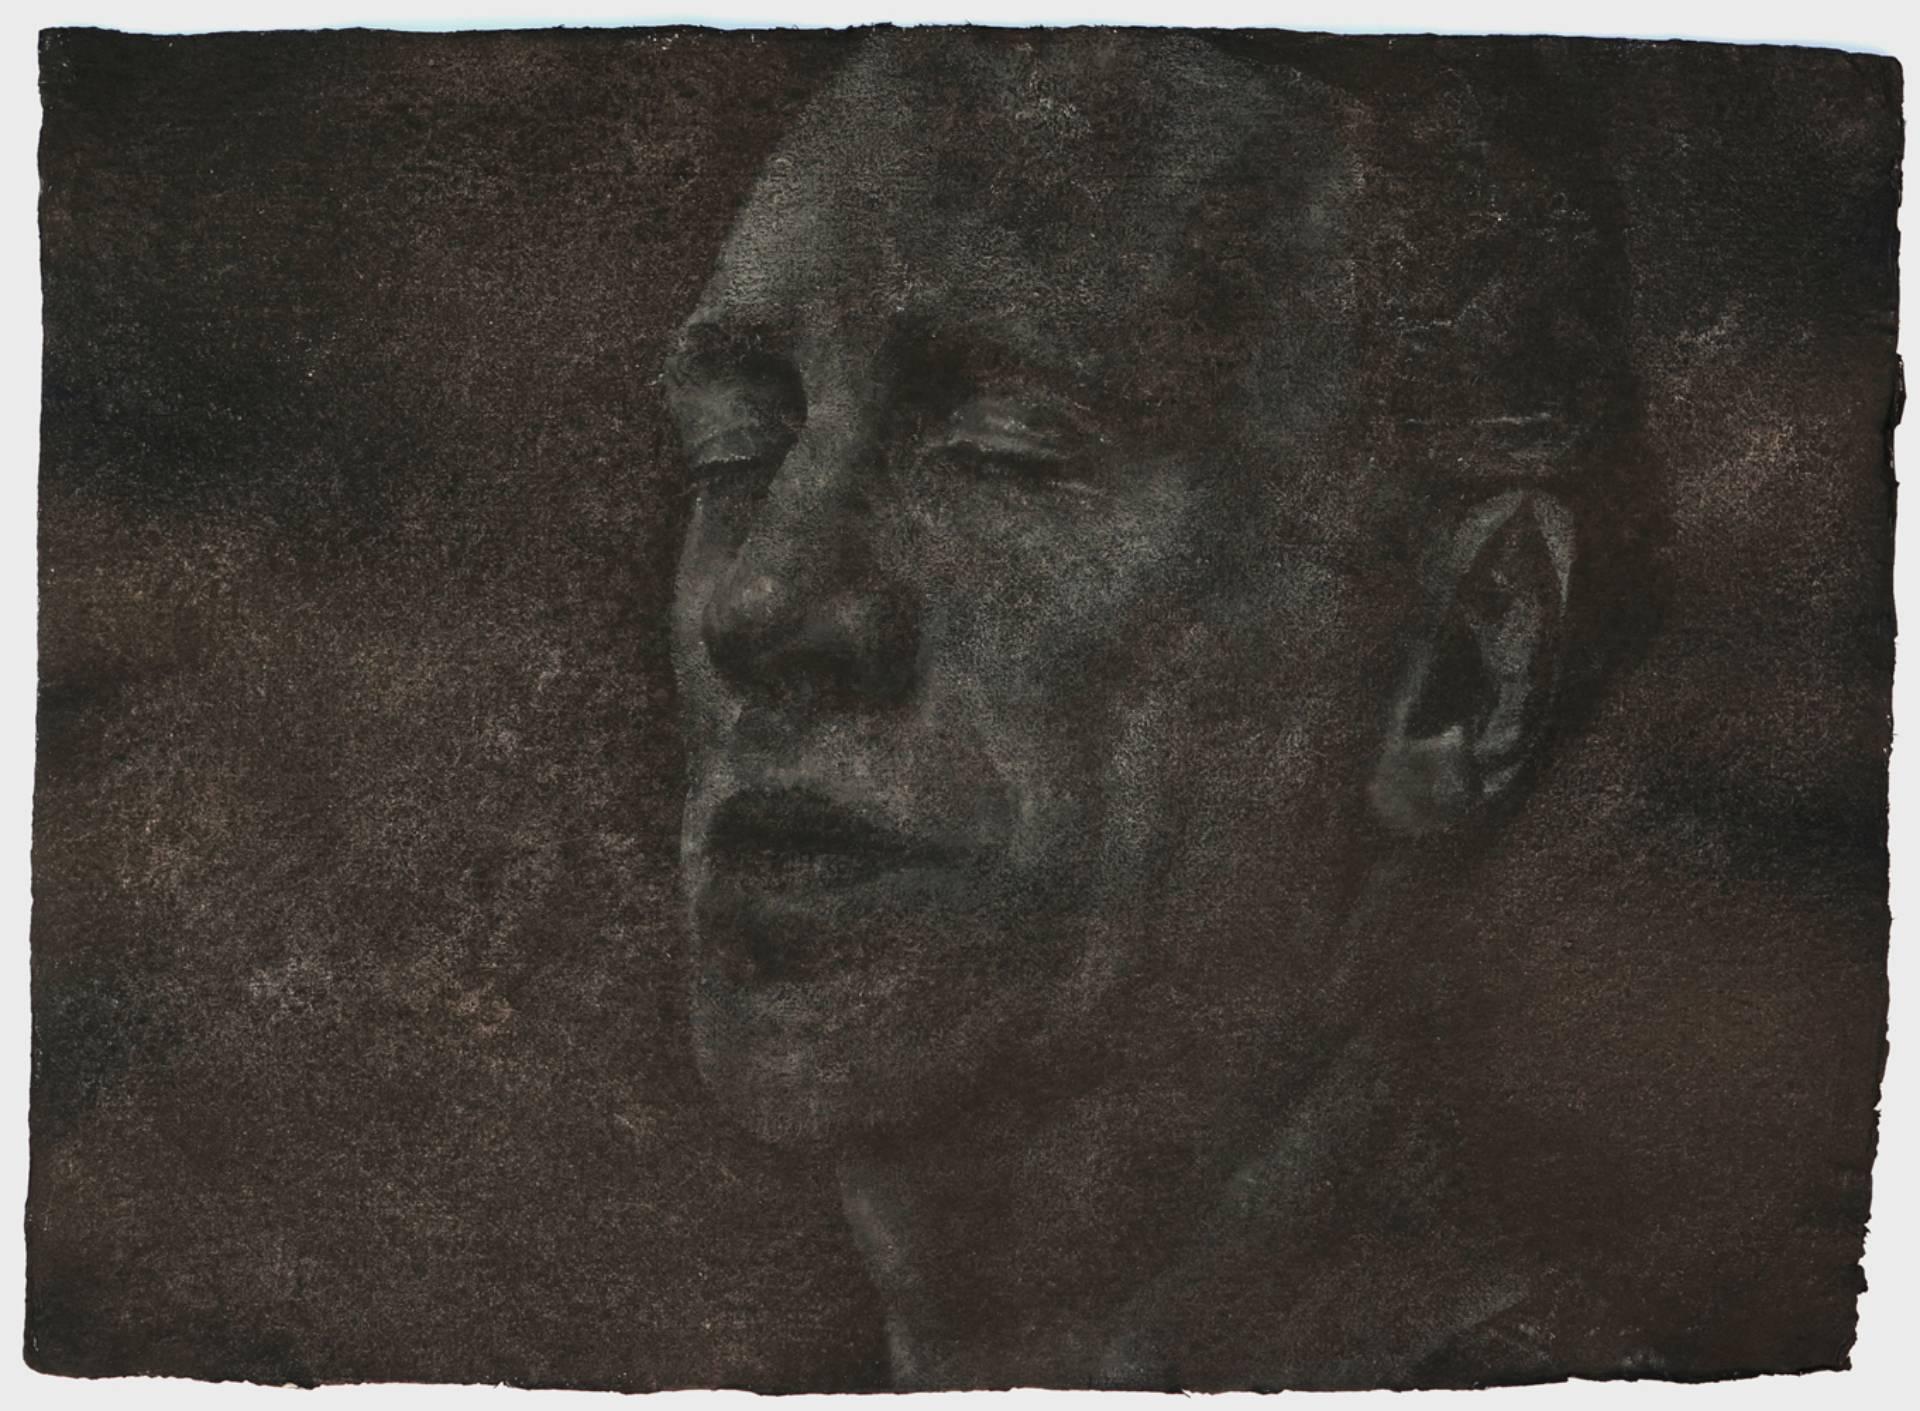 Vargtimmen no7, 56x76 cm,Oil on handmade paper, 2015